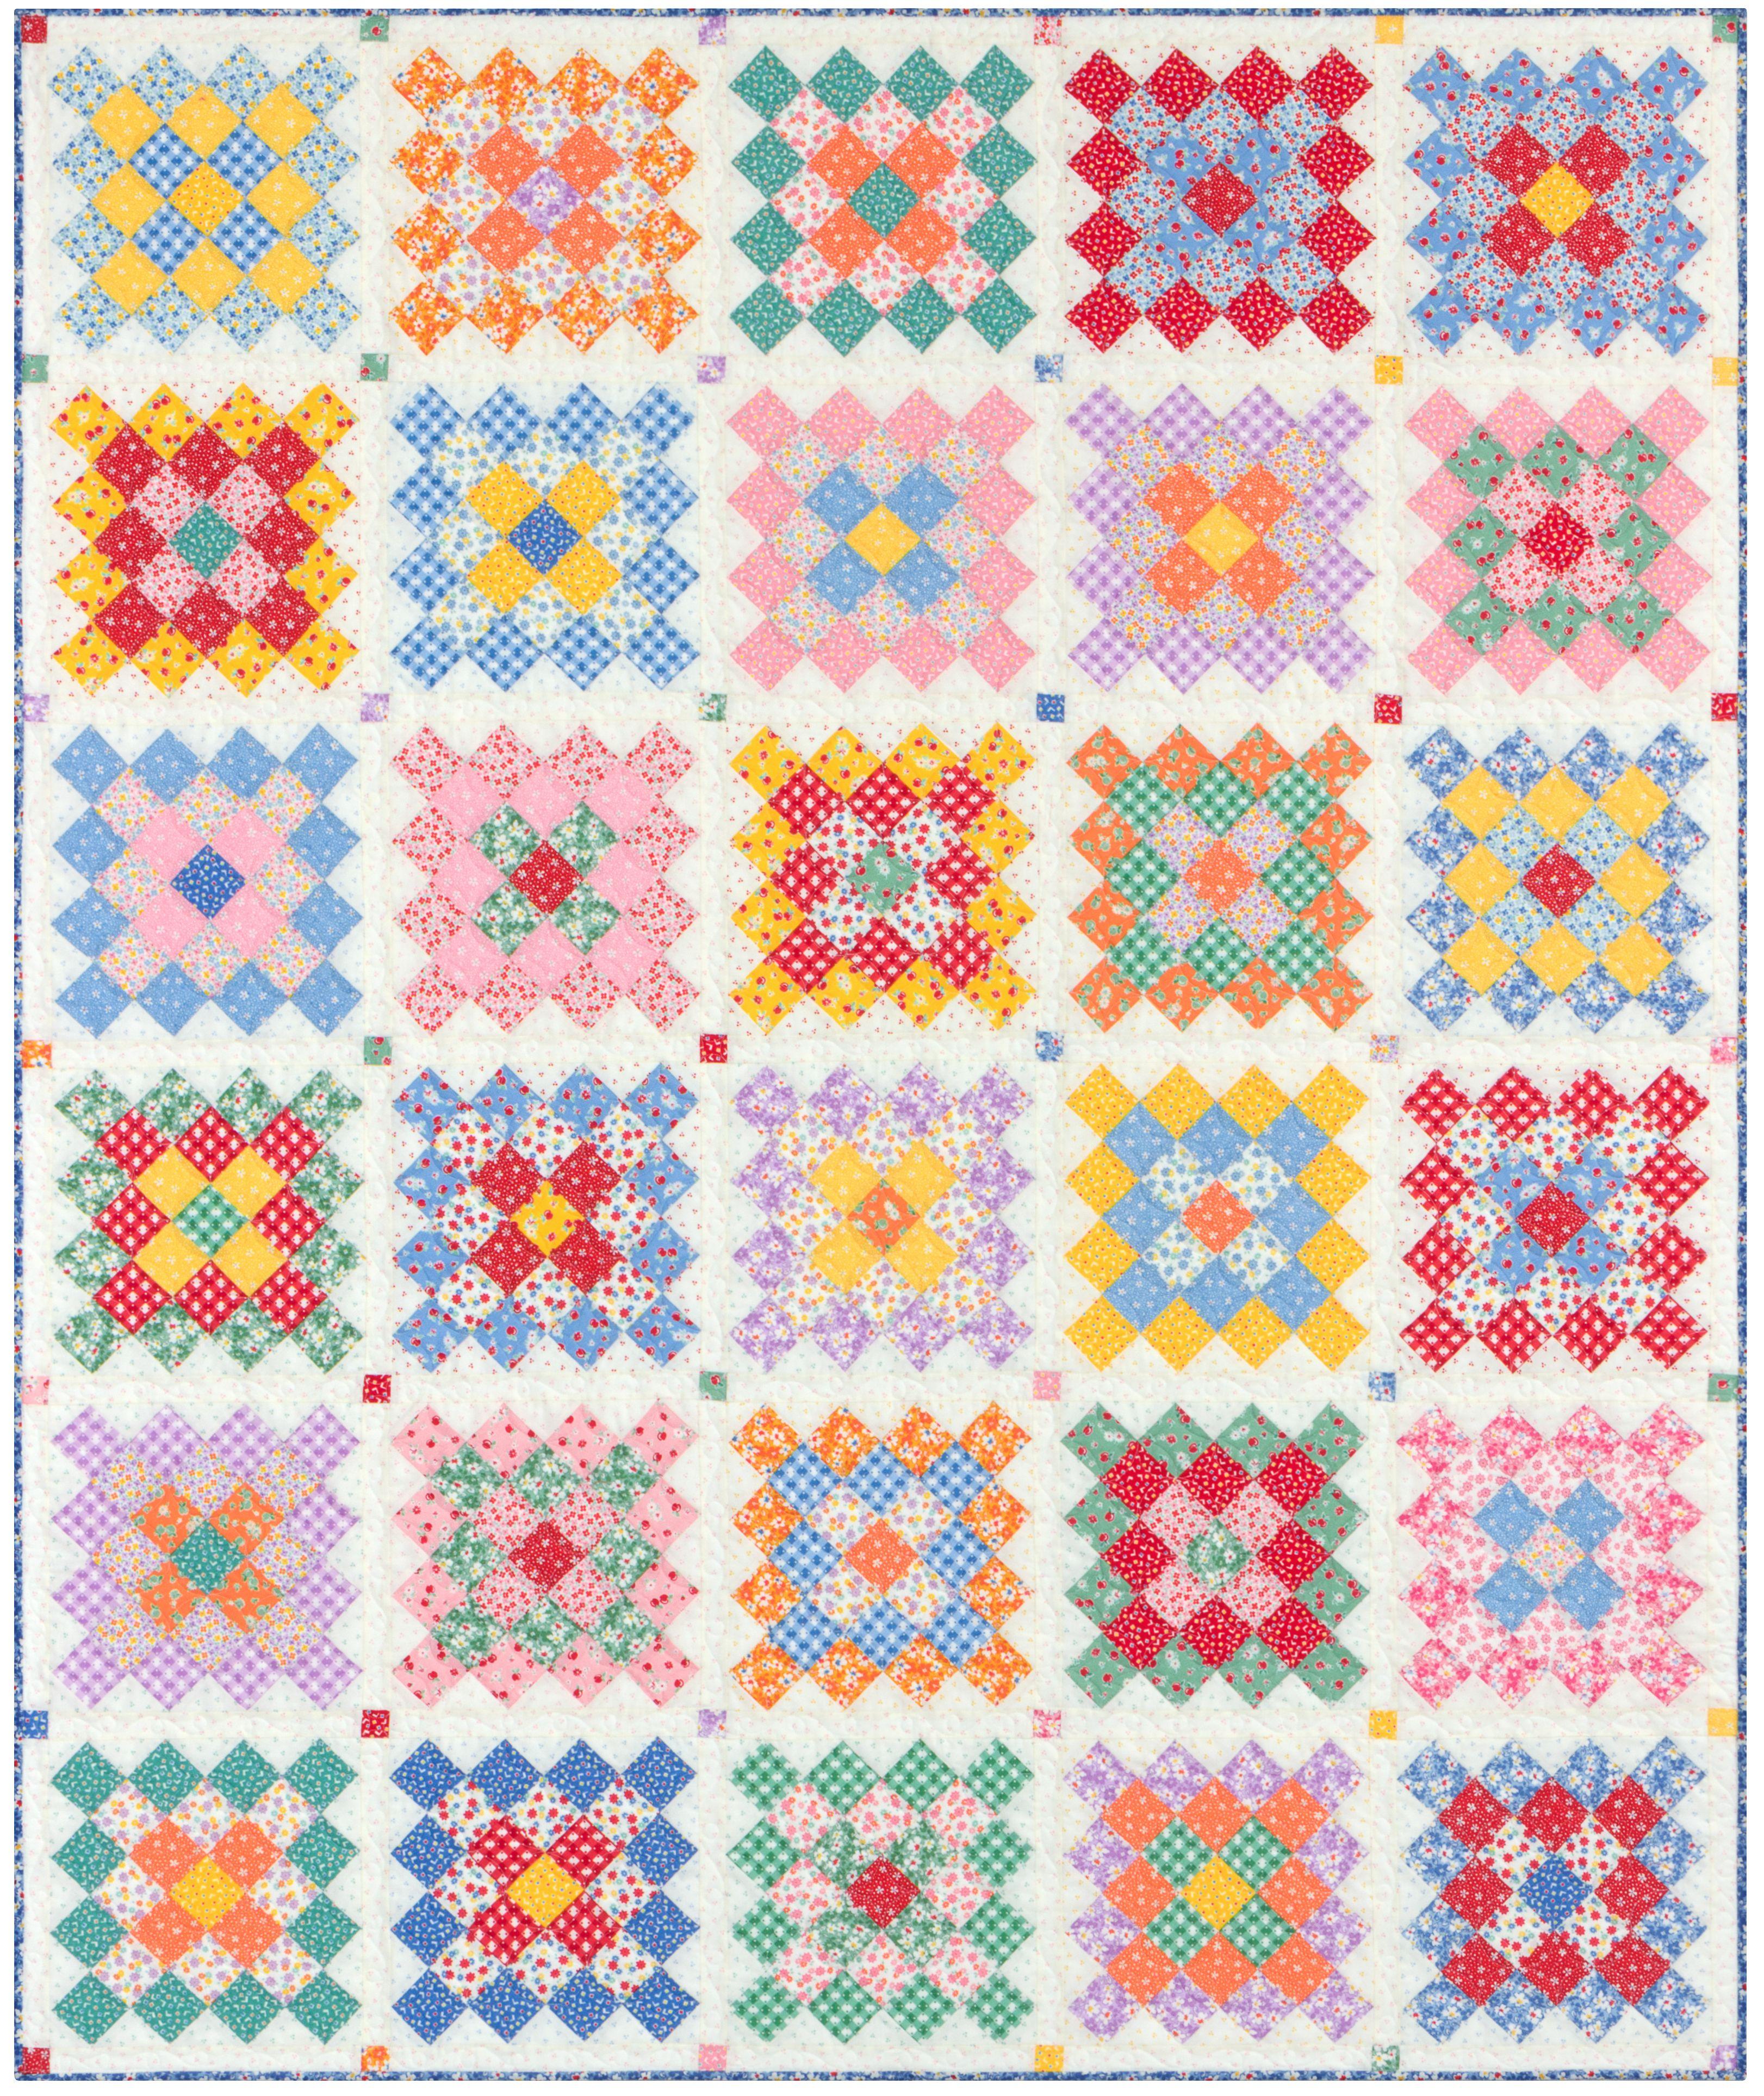 Quilt Pattern ~ DAISY PATCH ~ by Darlene Zimmerman